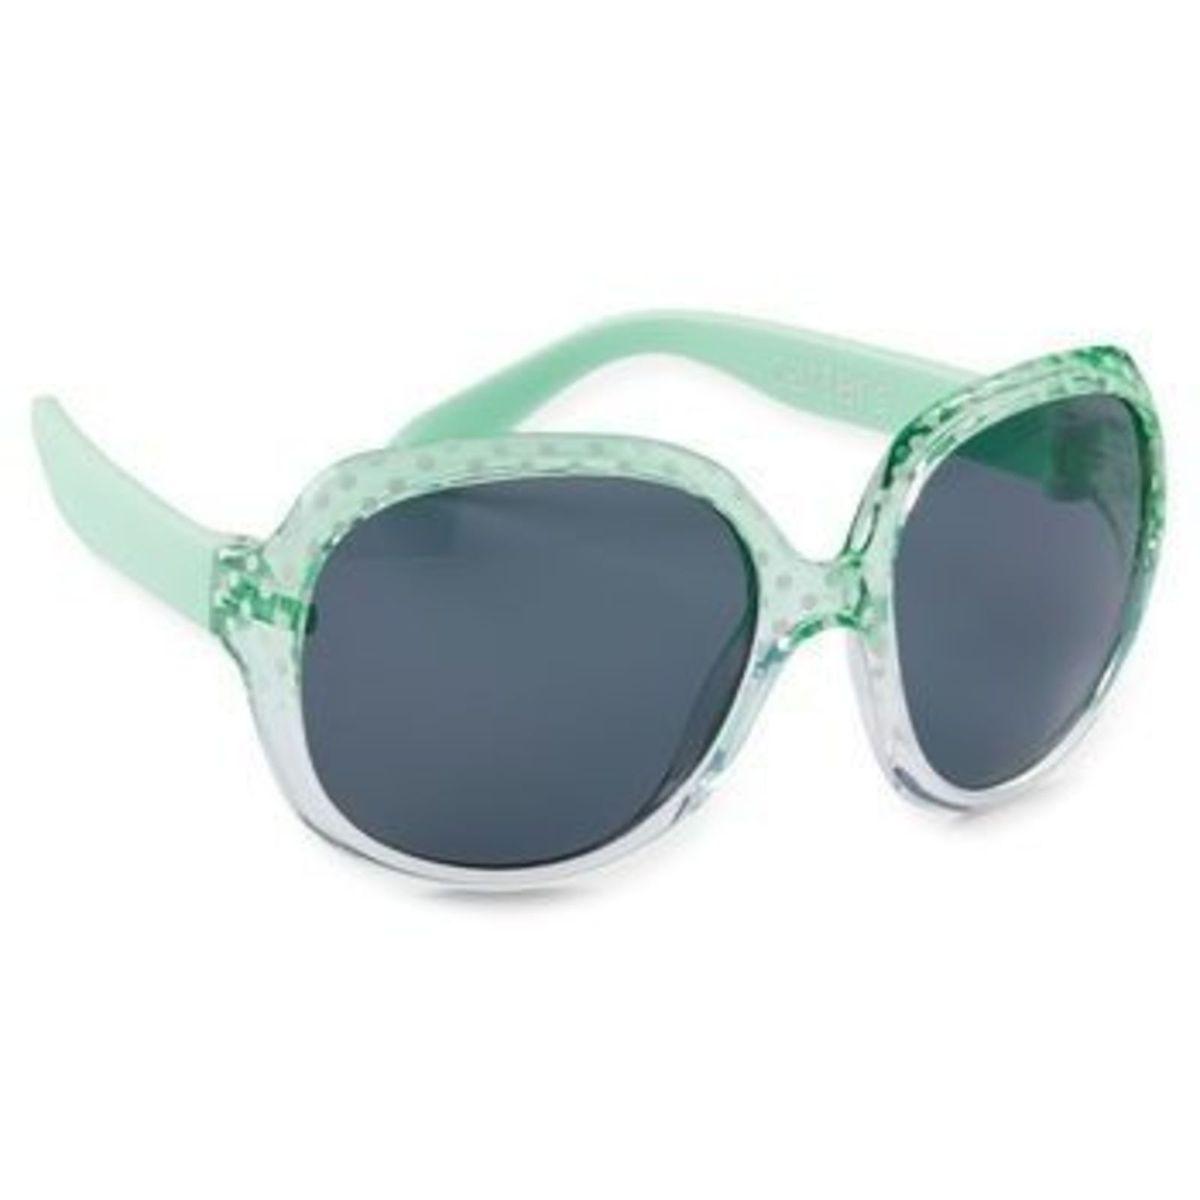 óculos de sol carter s - outros carter s.  Czm6ly9wag90b3muzw5qb2vplmnvbs5ici9wcm9kdwn0cy8xmtqwmtmvodc0oge2zgvkodqxmdllnzcxmmzjyzkxymjlngmwmwmuanbn 7014555030